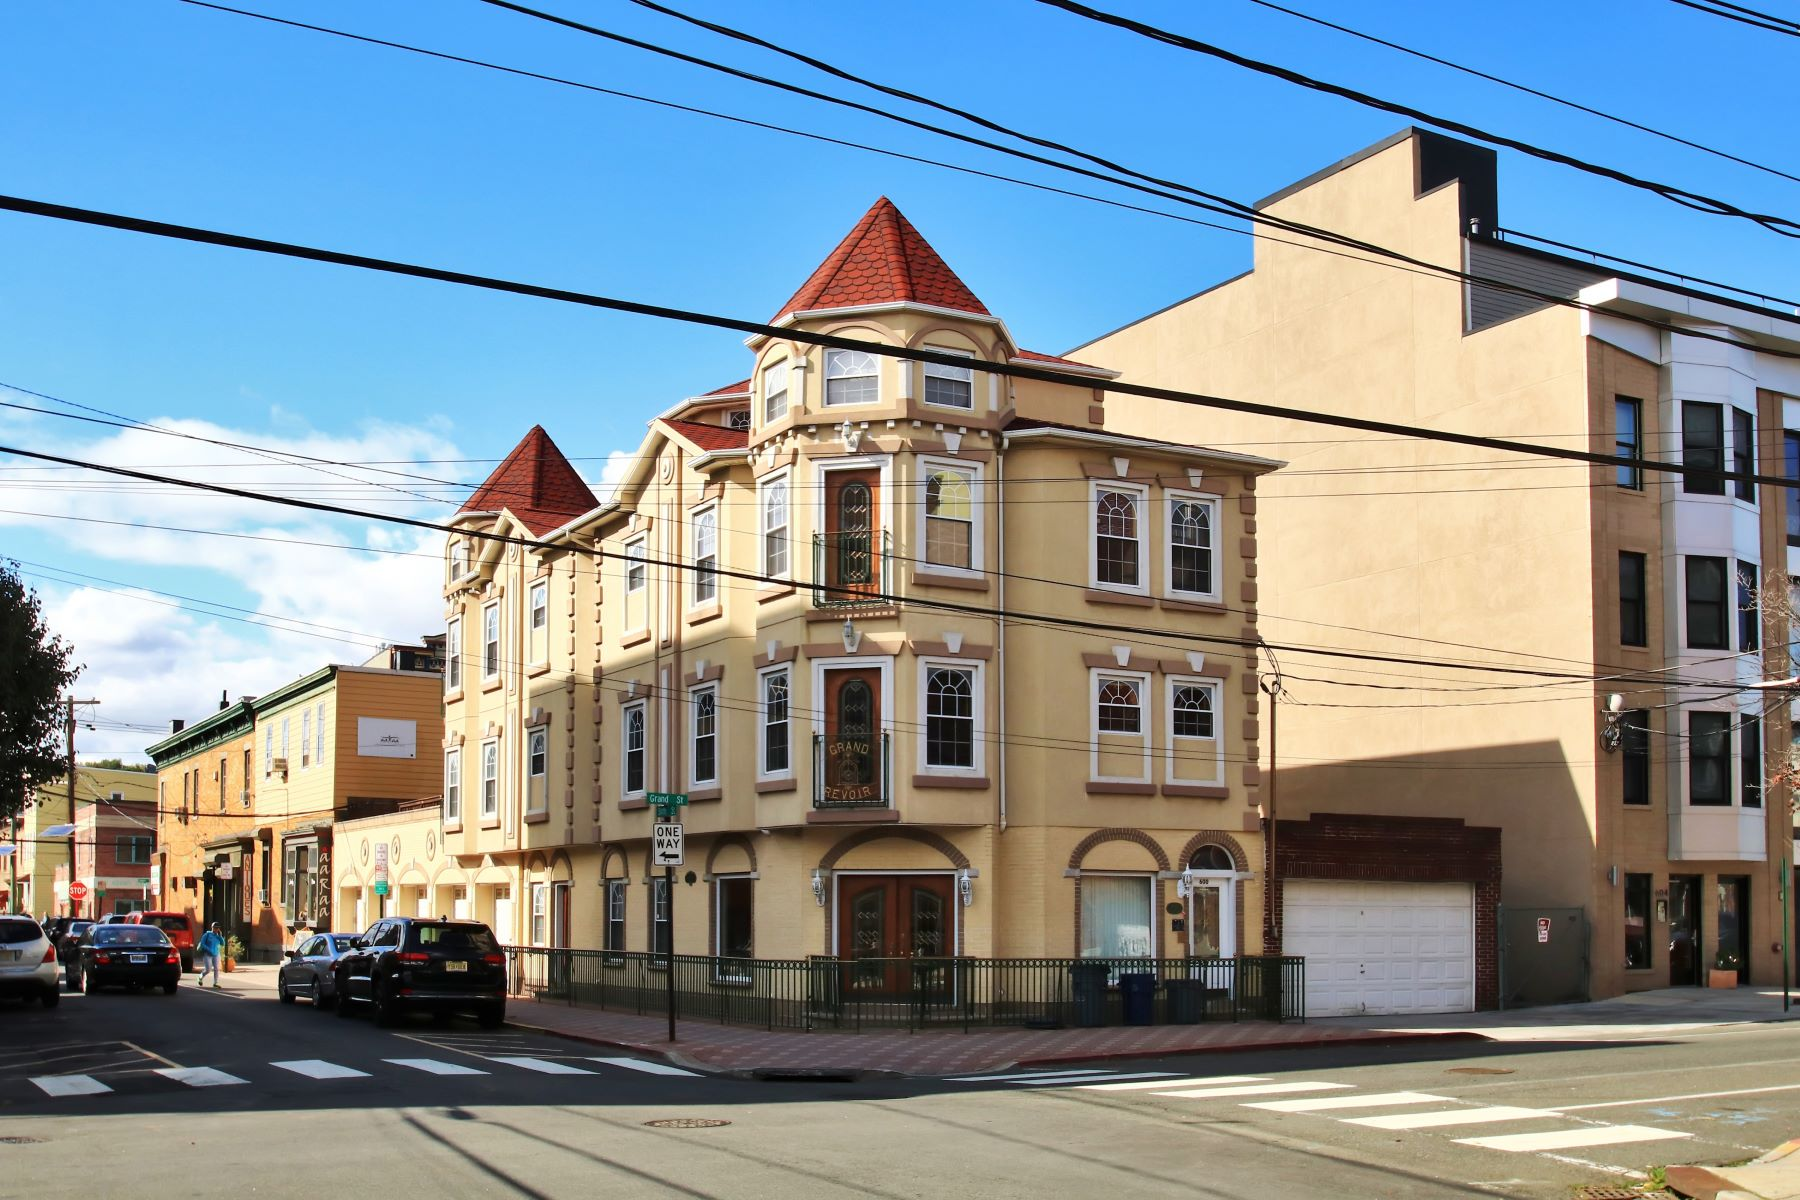 Moradia Multi-familiar para Venda às Great Investment Opportunity ~ Mixed Use Multi-Family! 600 Grand Street Hoboken, Nova Jersey, 07030 Estados Unidos